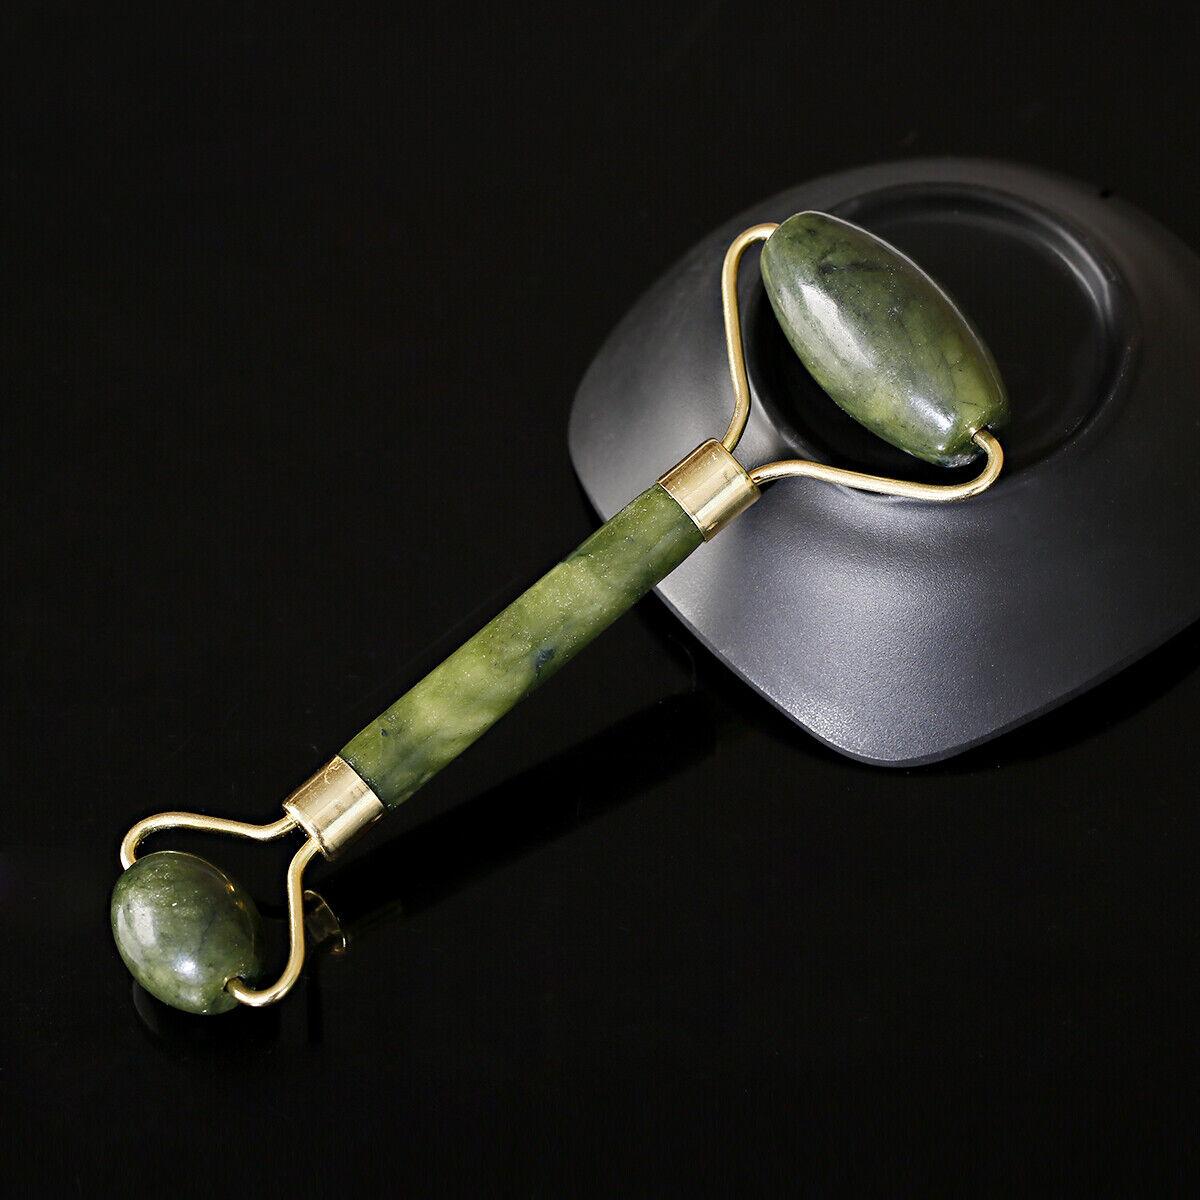 1 Pack Jade Roller Face Body Eye Kit Gua Sha Anti Aging Wrinkle Massager Tool 1